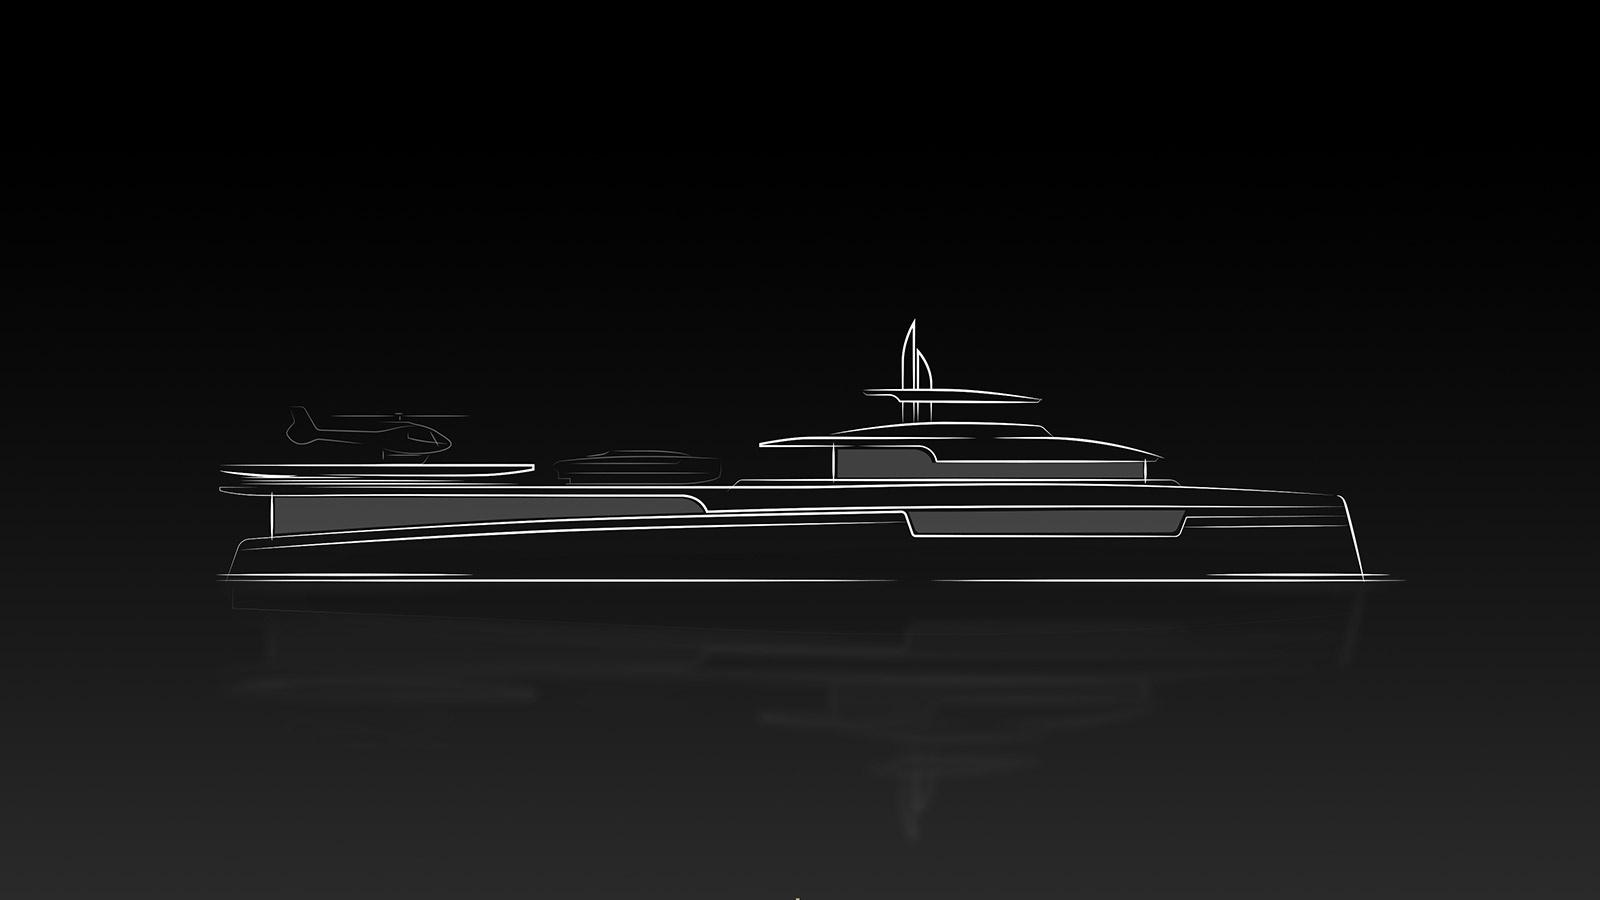 royal huisman project lotus supply vessel - boat shopping